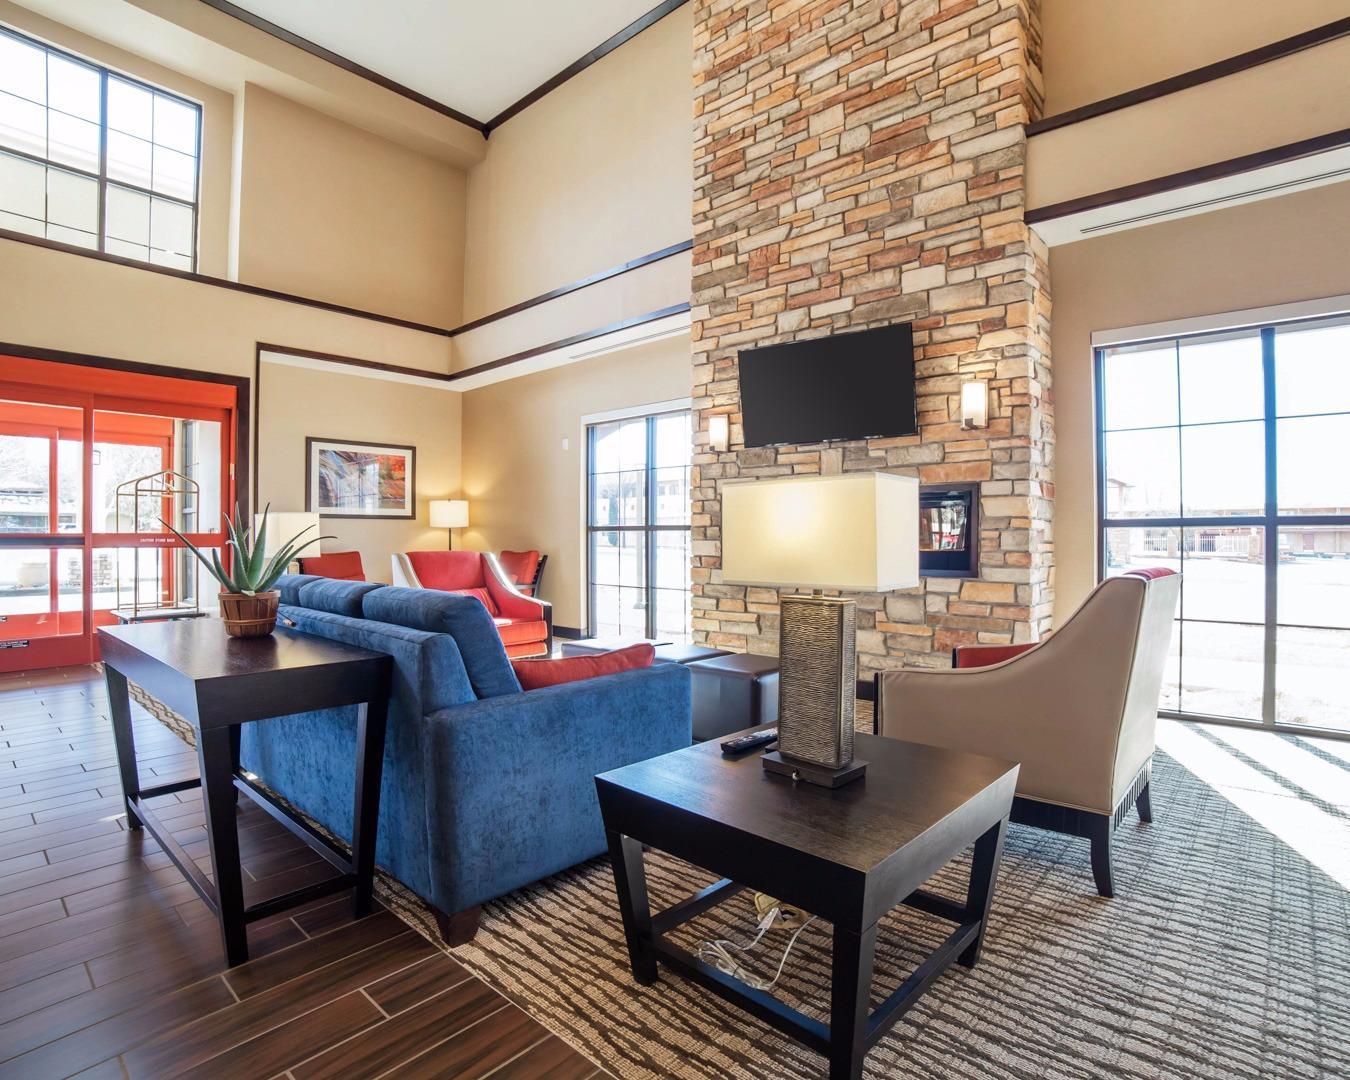 Comfort Suites image 2